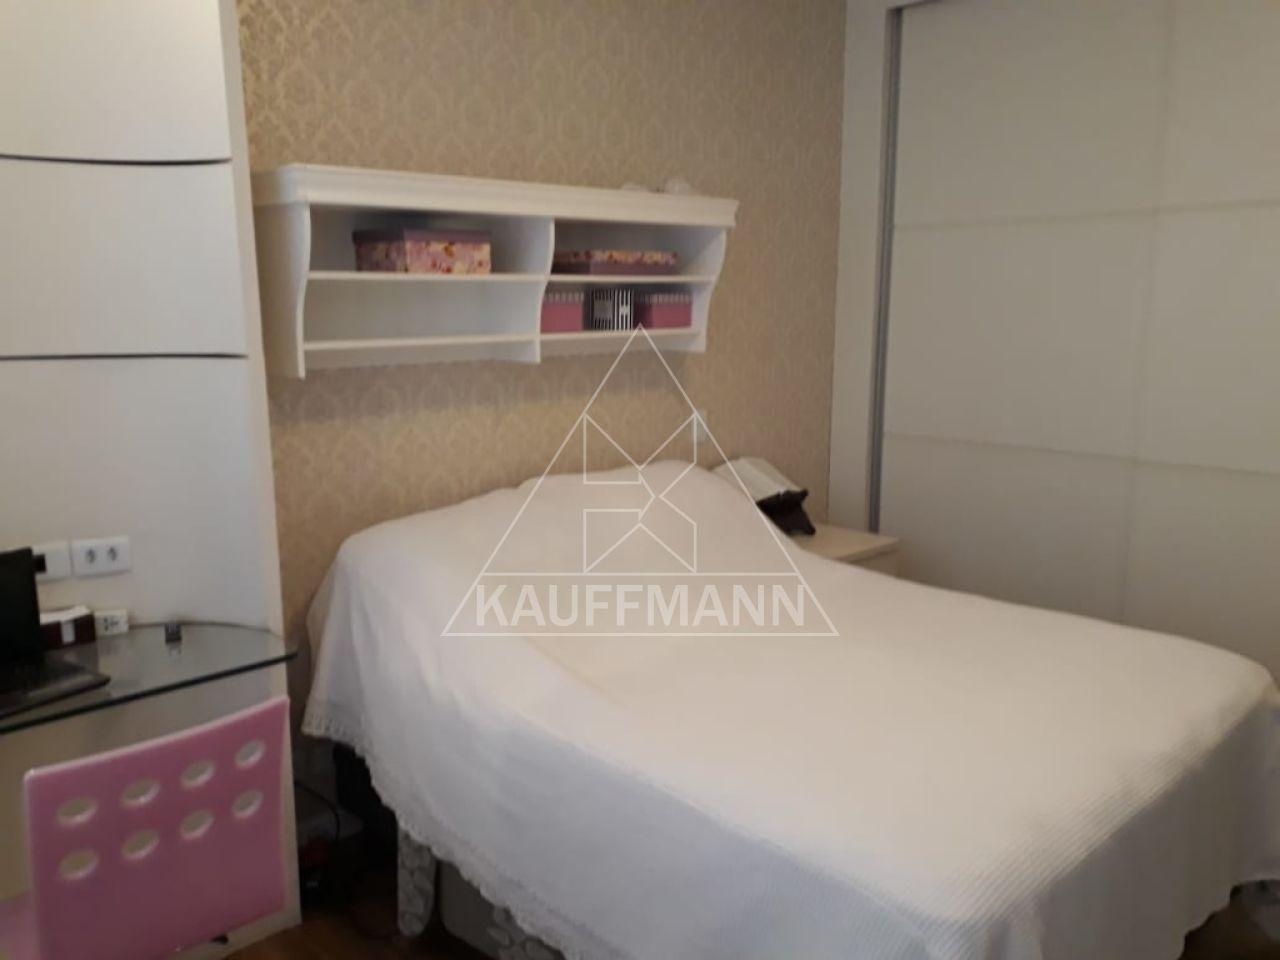 apartamento-venda-sao-paulo-jardim-paulista-3dormitorios-3suites-1vaga-174m2-Foto6